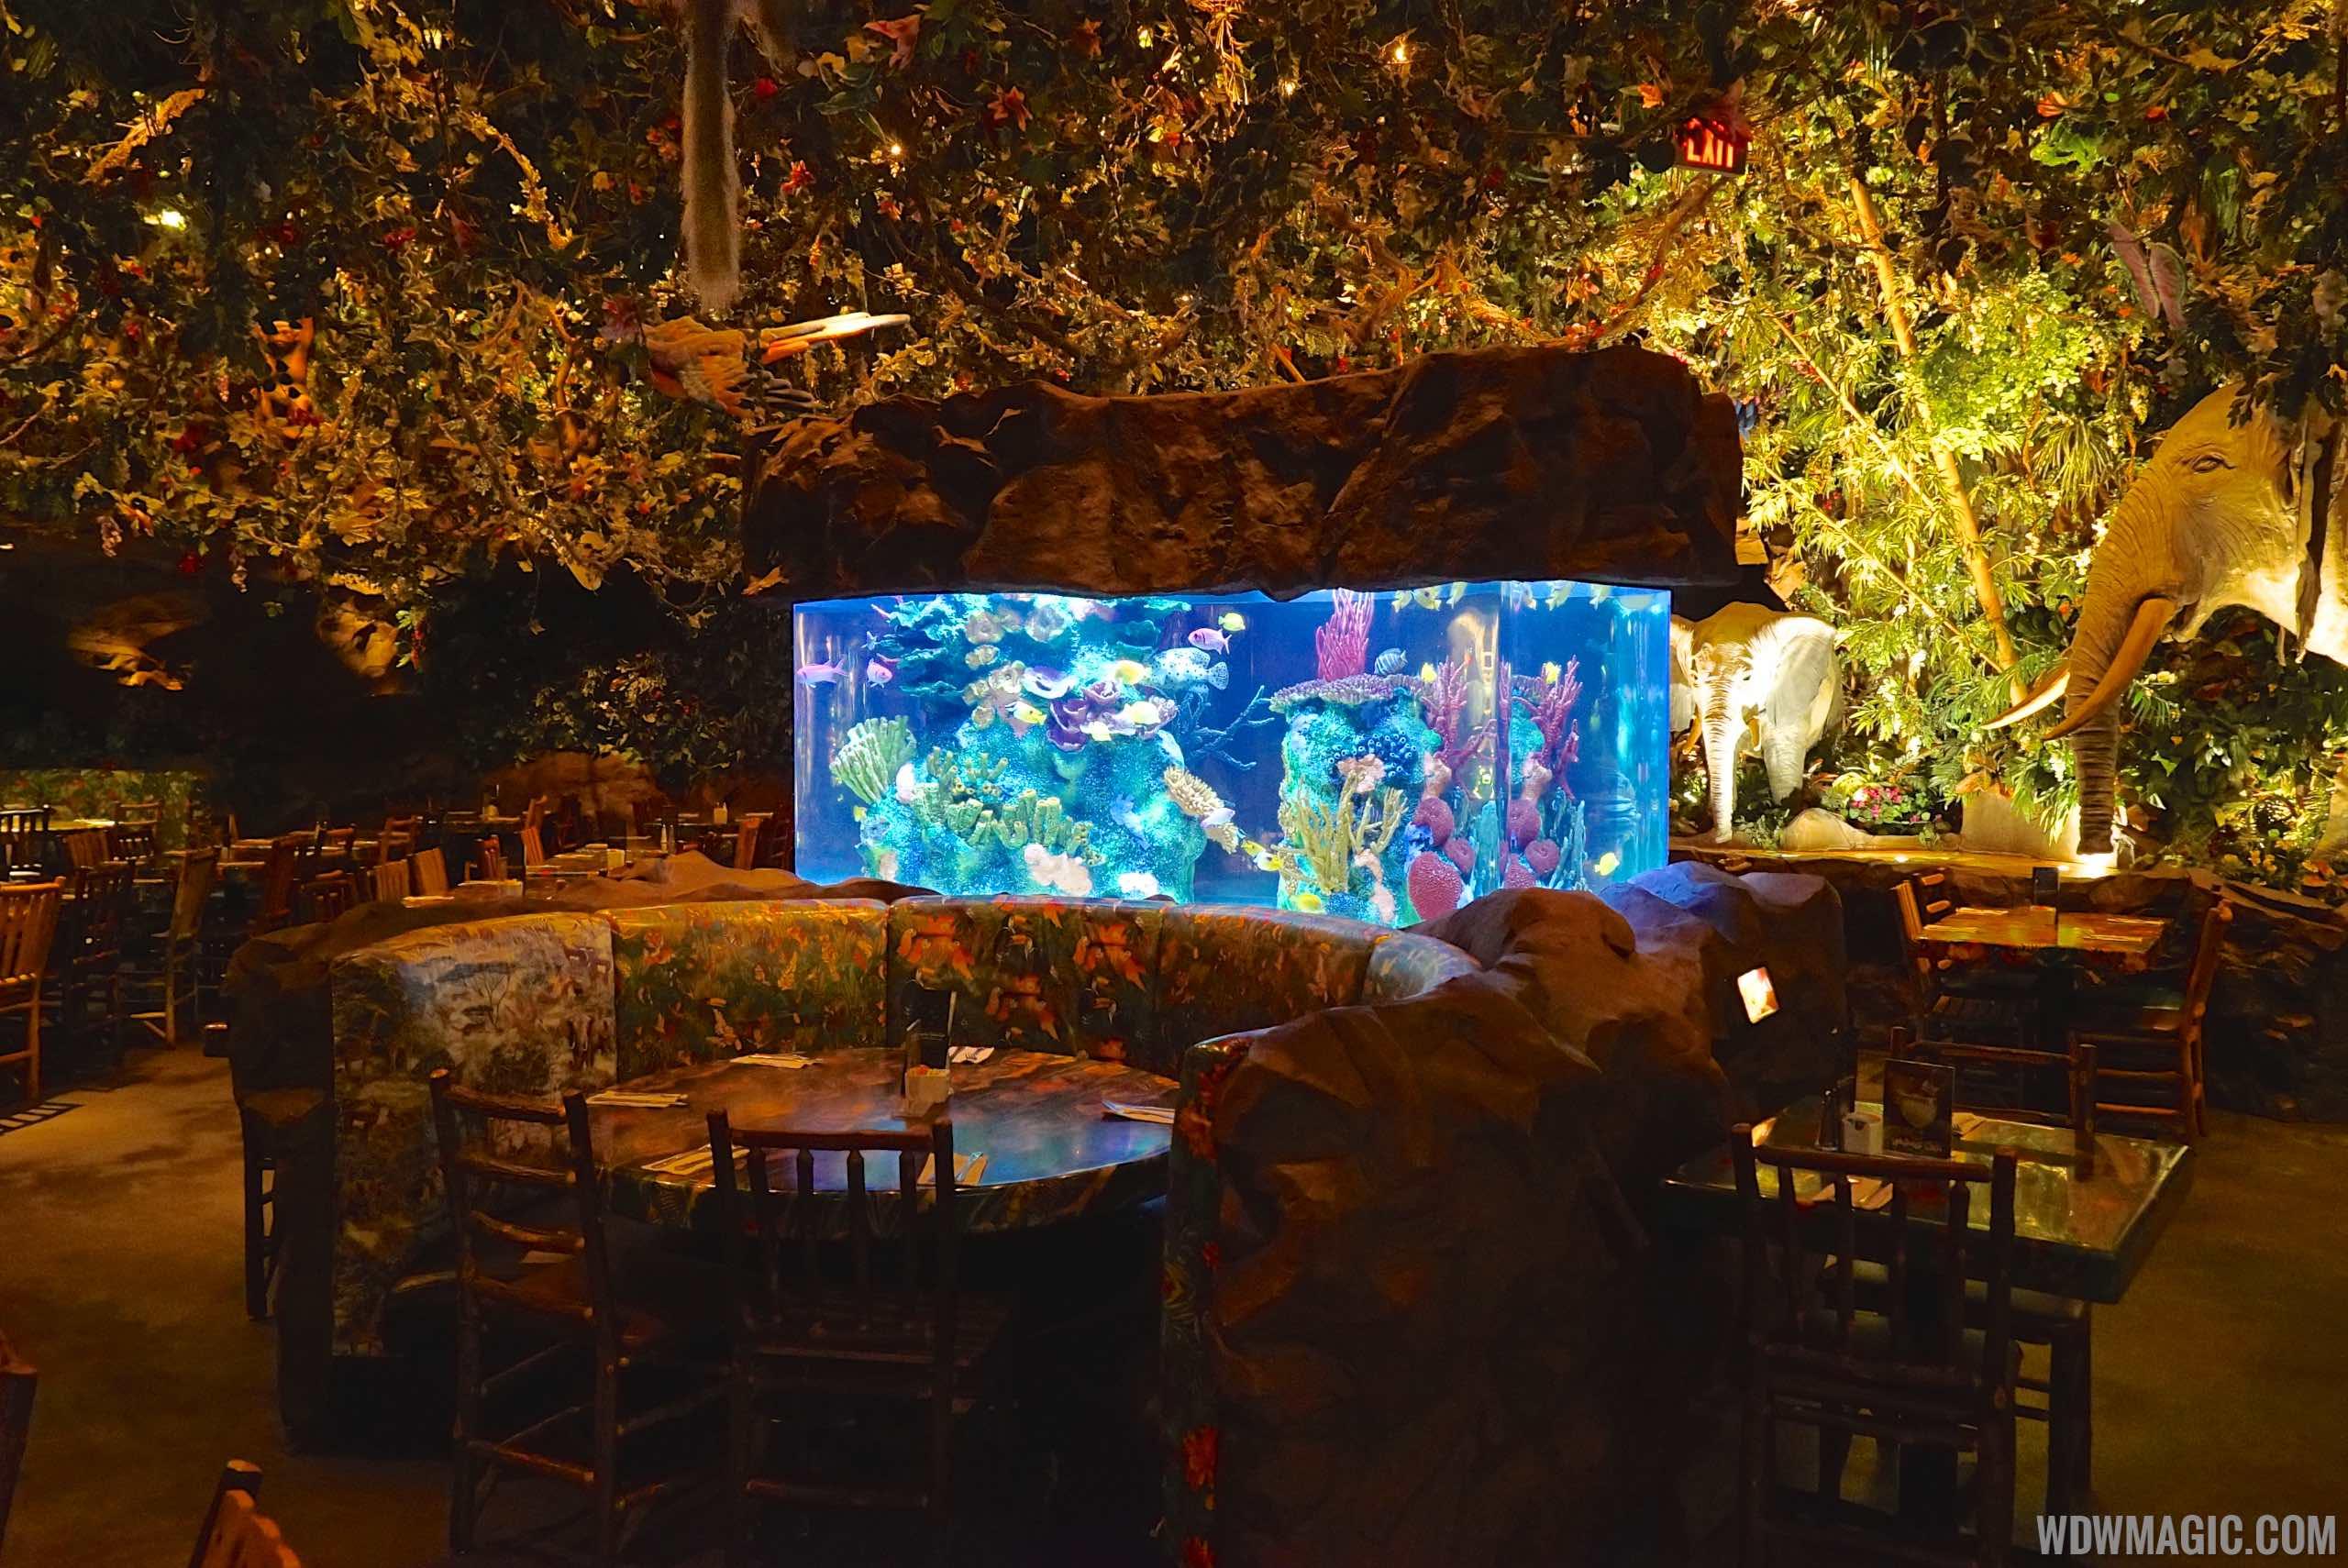 Rainforest Cafe Disney's Animal Kingdom on science cafe, halloween cafe, corner bakery cafe, jungle cafe, zoo cafe, aquarium cafe, blue cafe, vegas cafe, sunrise cafe, sandella's flatbread cafe, hardrock cafe, animal cafe, first hard rock cafe, london cafe, new hard rock cafe, disney cafe, t-rex cafe, island cafe, space cafe, urbane cafe,